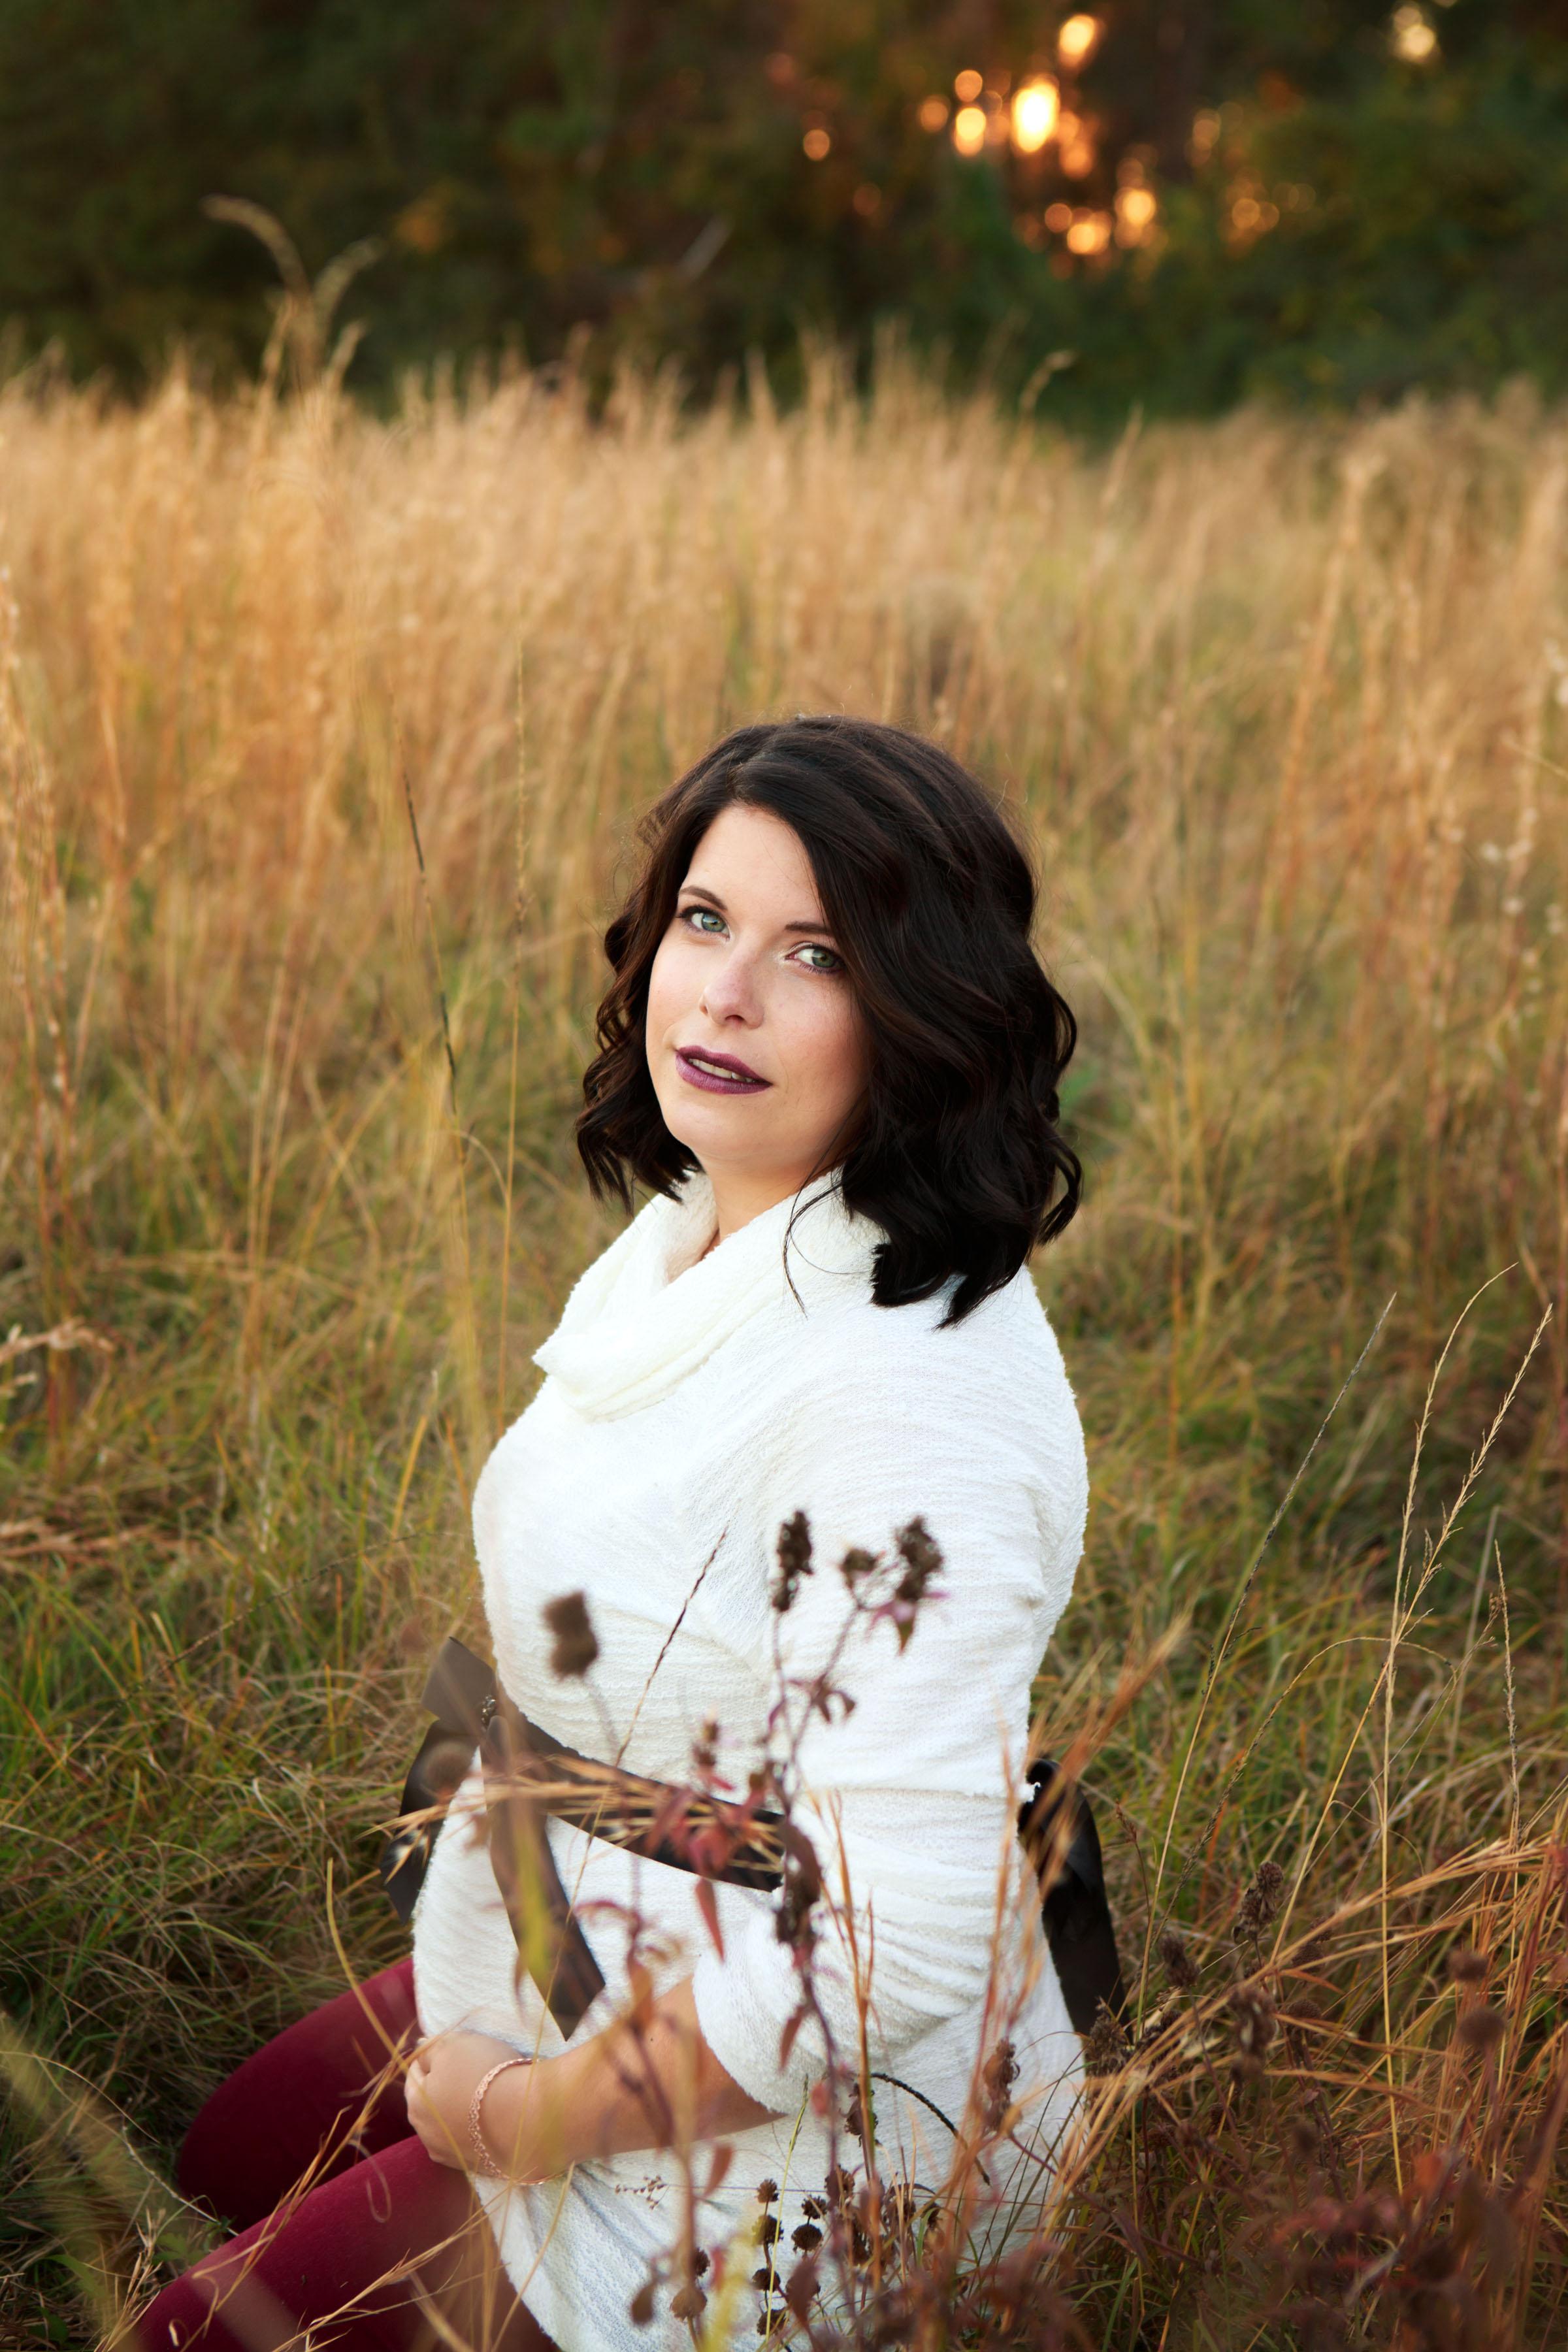 NC_Maternity_Photographer_Tiffany_Abruzzo_Photography_1.jpg